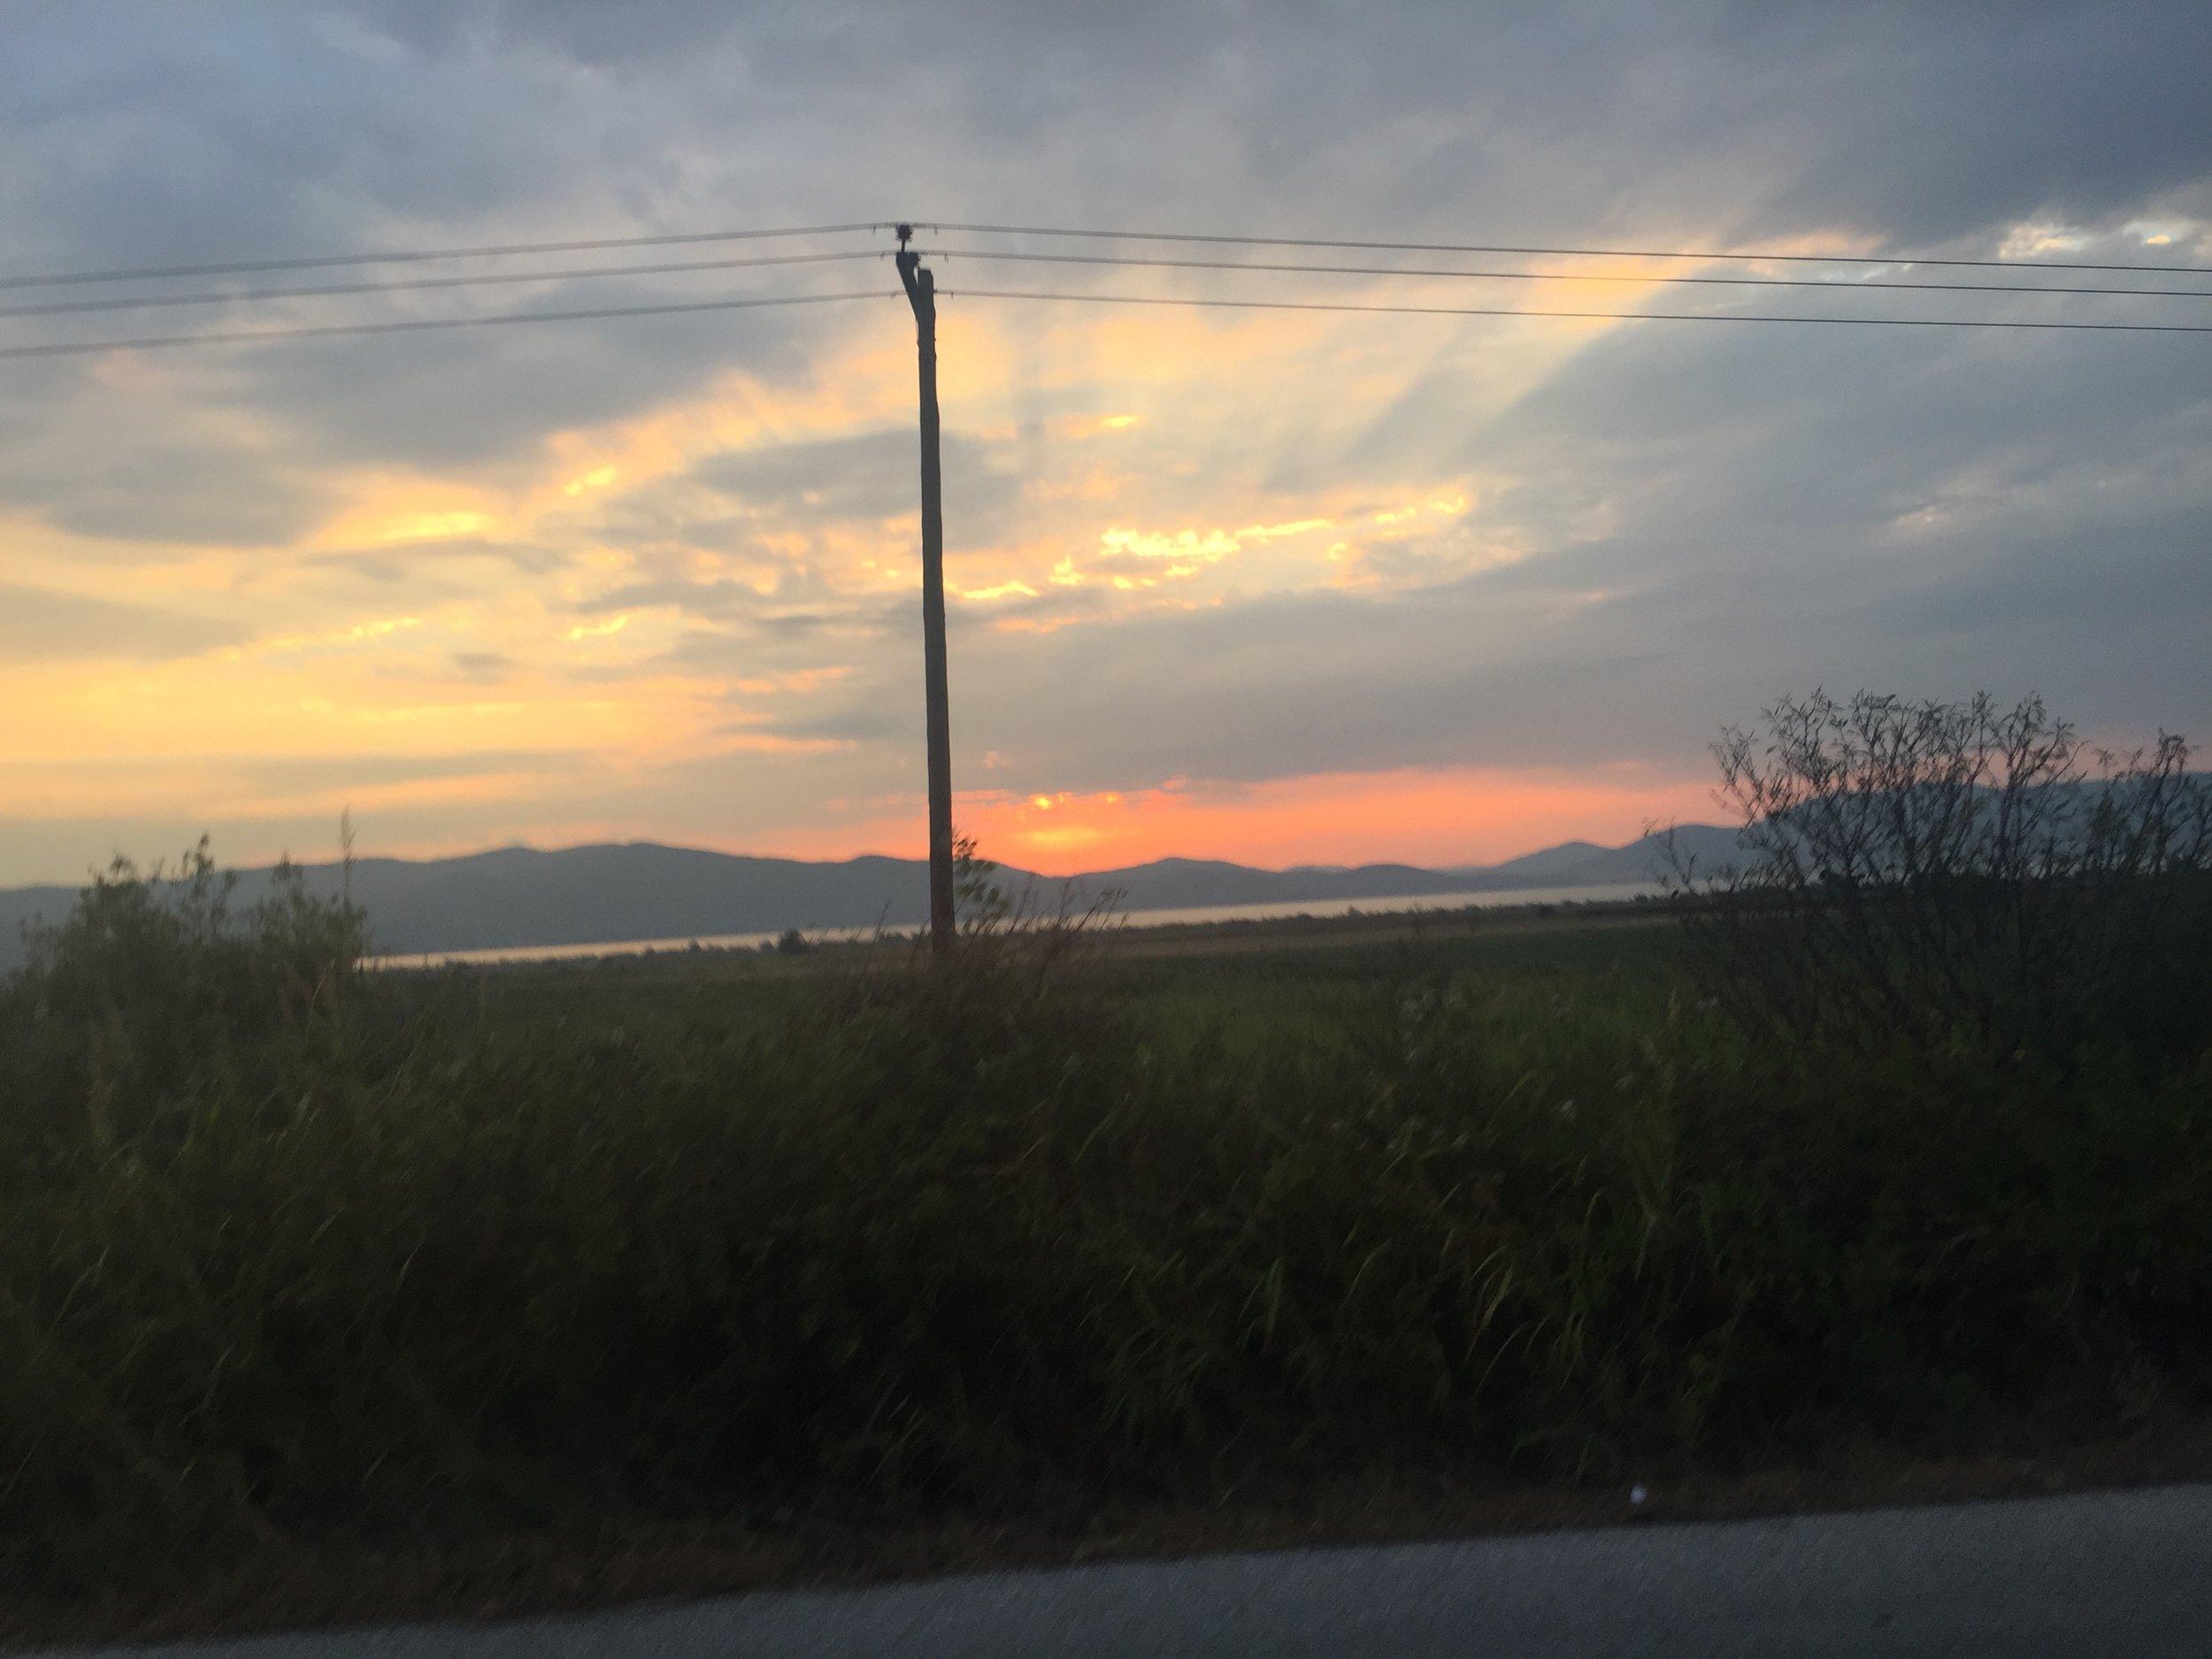 In Greece, overlooking Macedonia